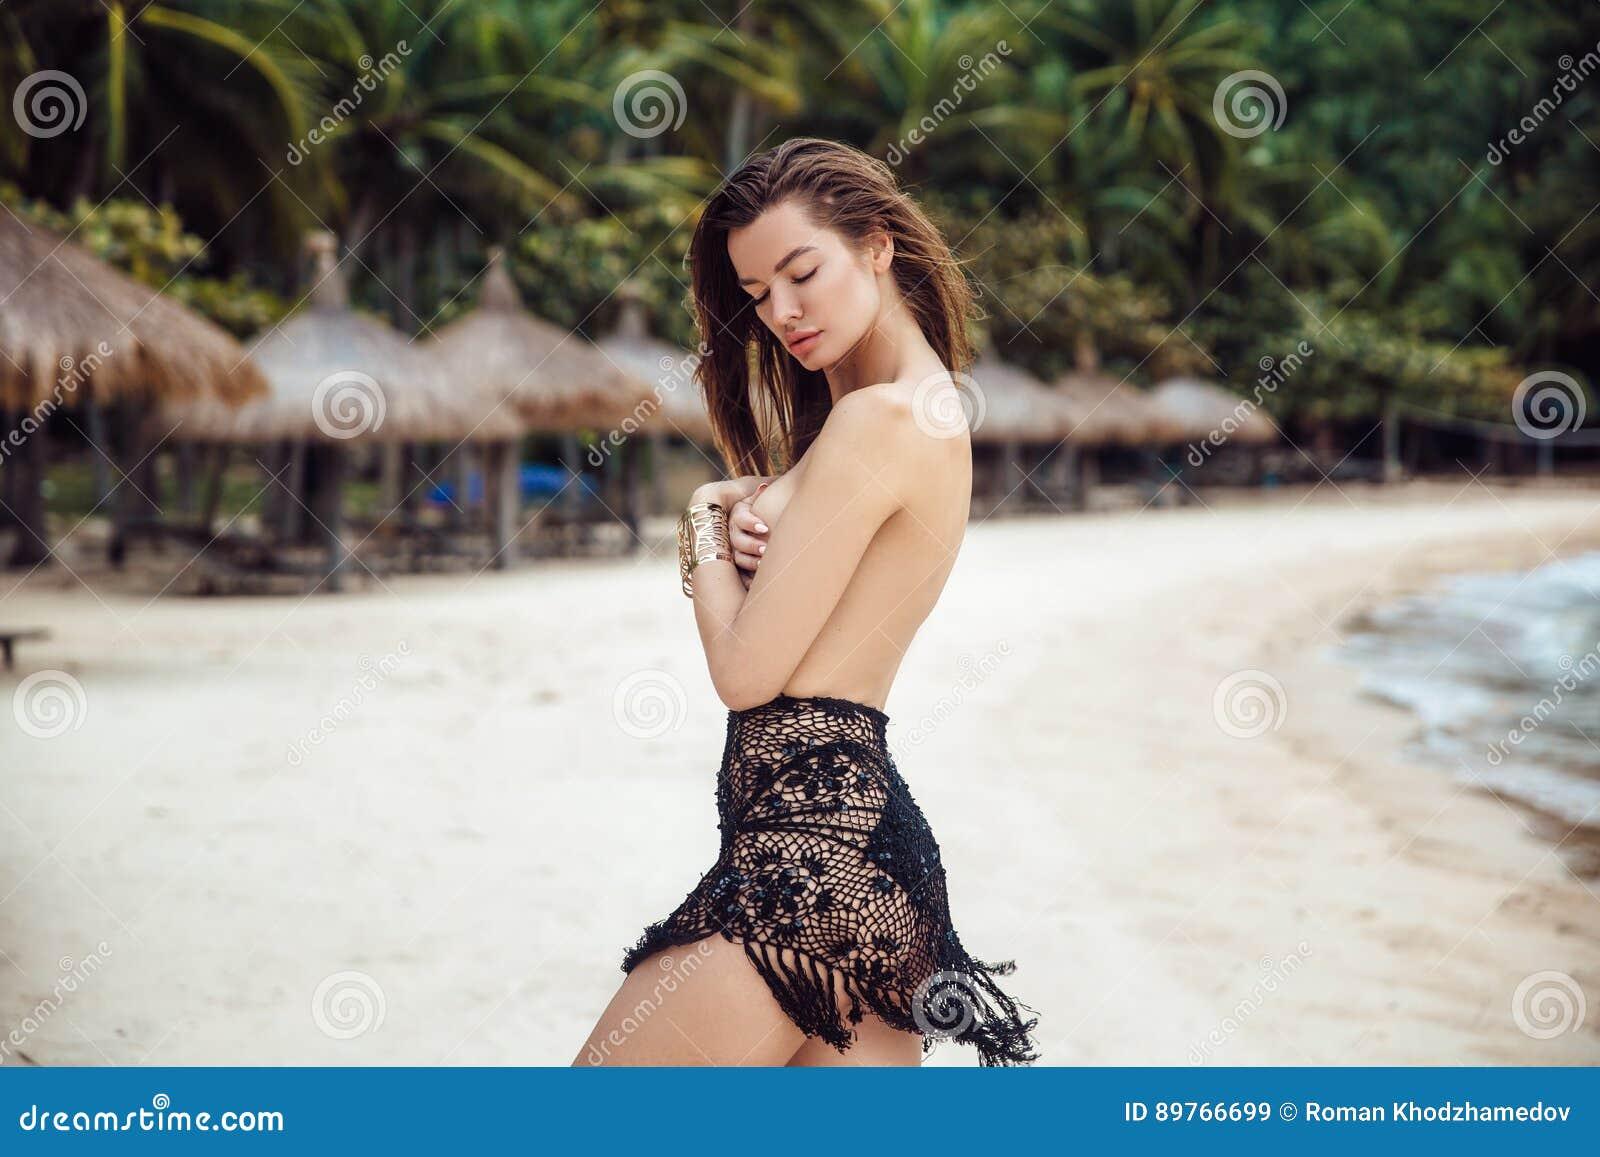 4a8cce679c Portrait Of Woman In Black Bikini Swimwear